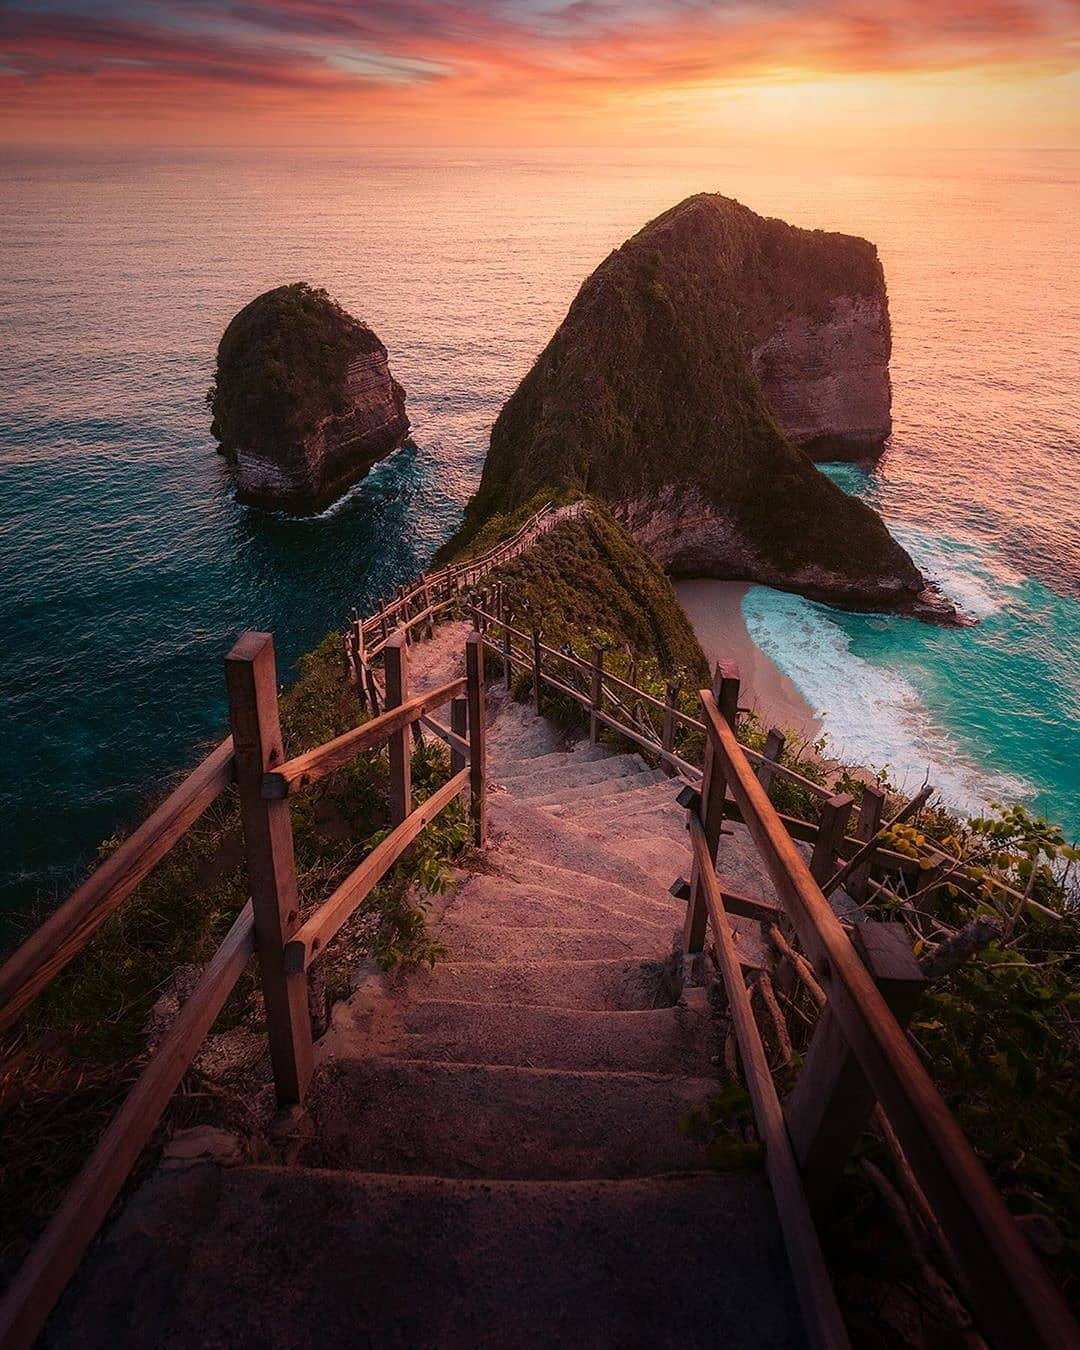 Kelingking Beach Nusa Penida Image From @pantaikelingking